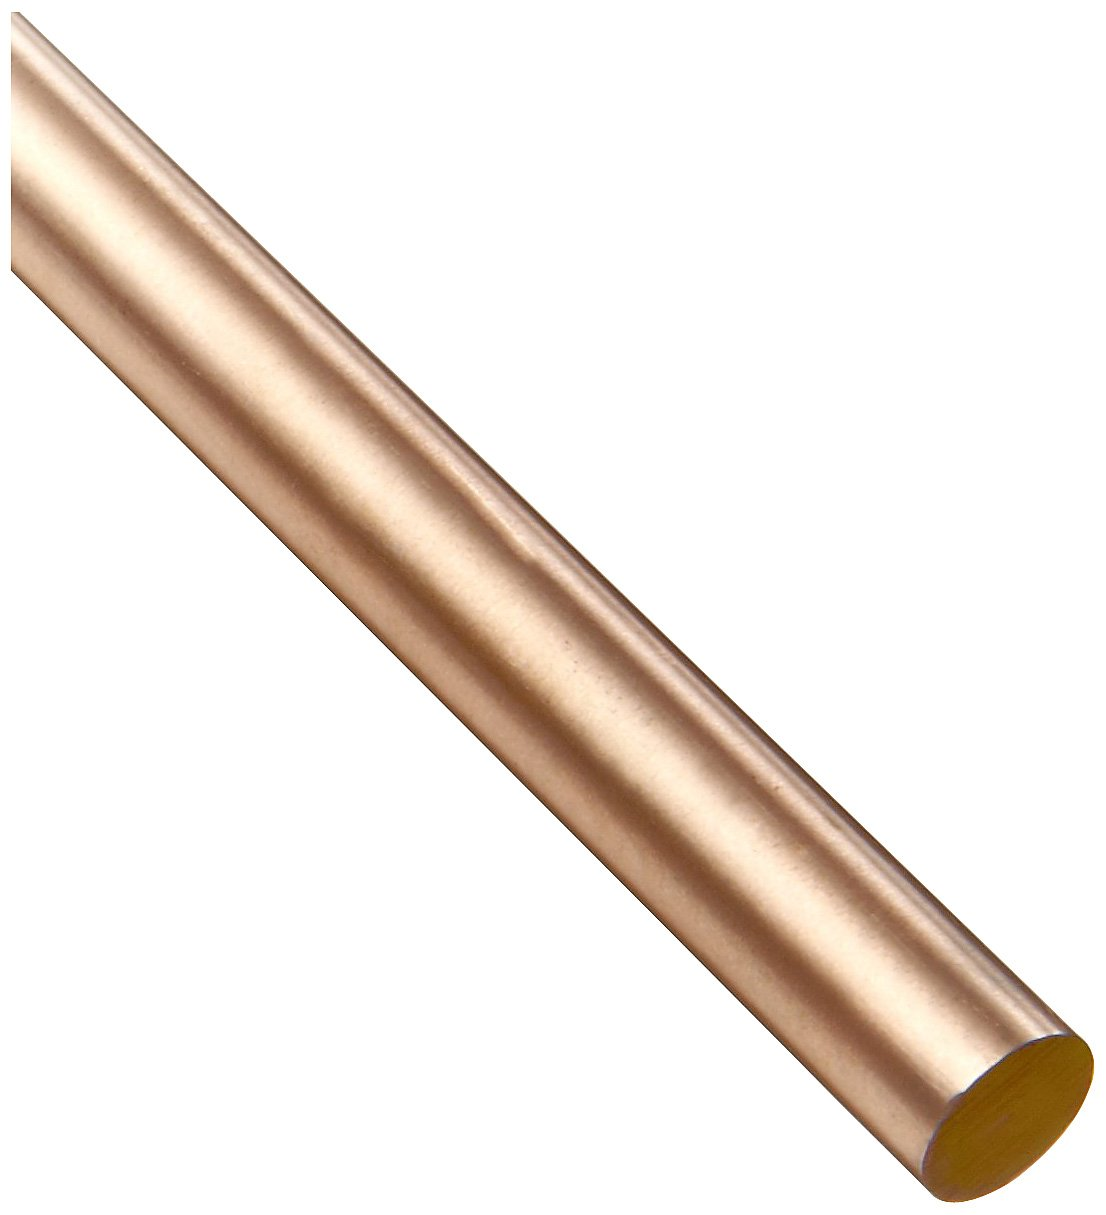 RWMA CL 10 12 Length Precision Tolerance Copper Tungsten Round Rod 1//8 Diameter Ground